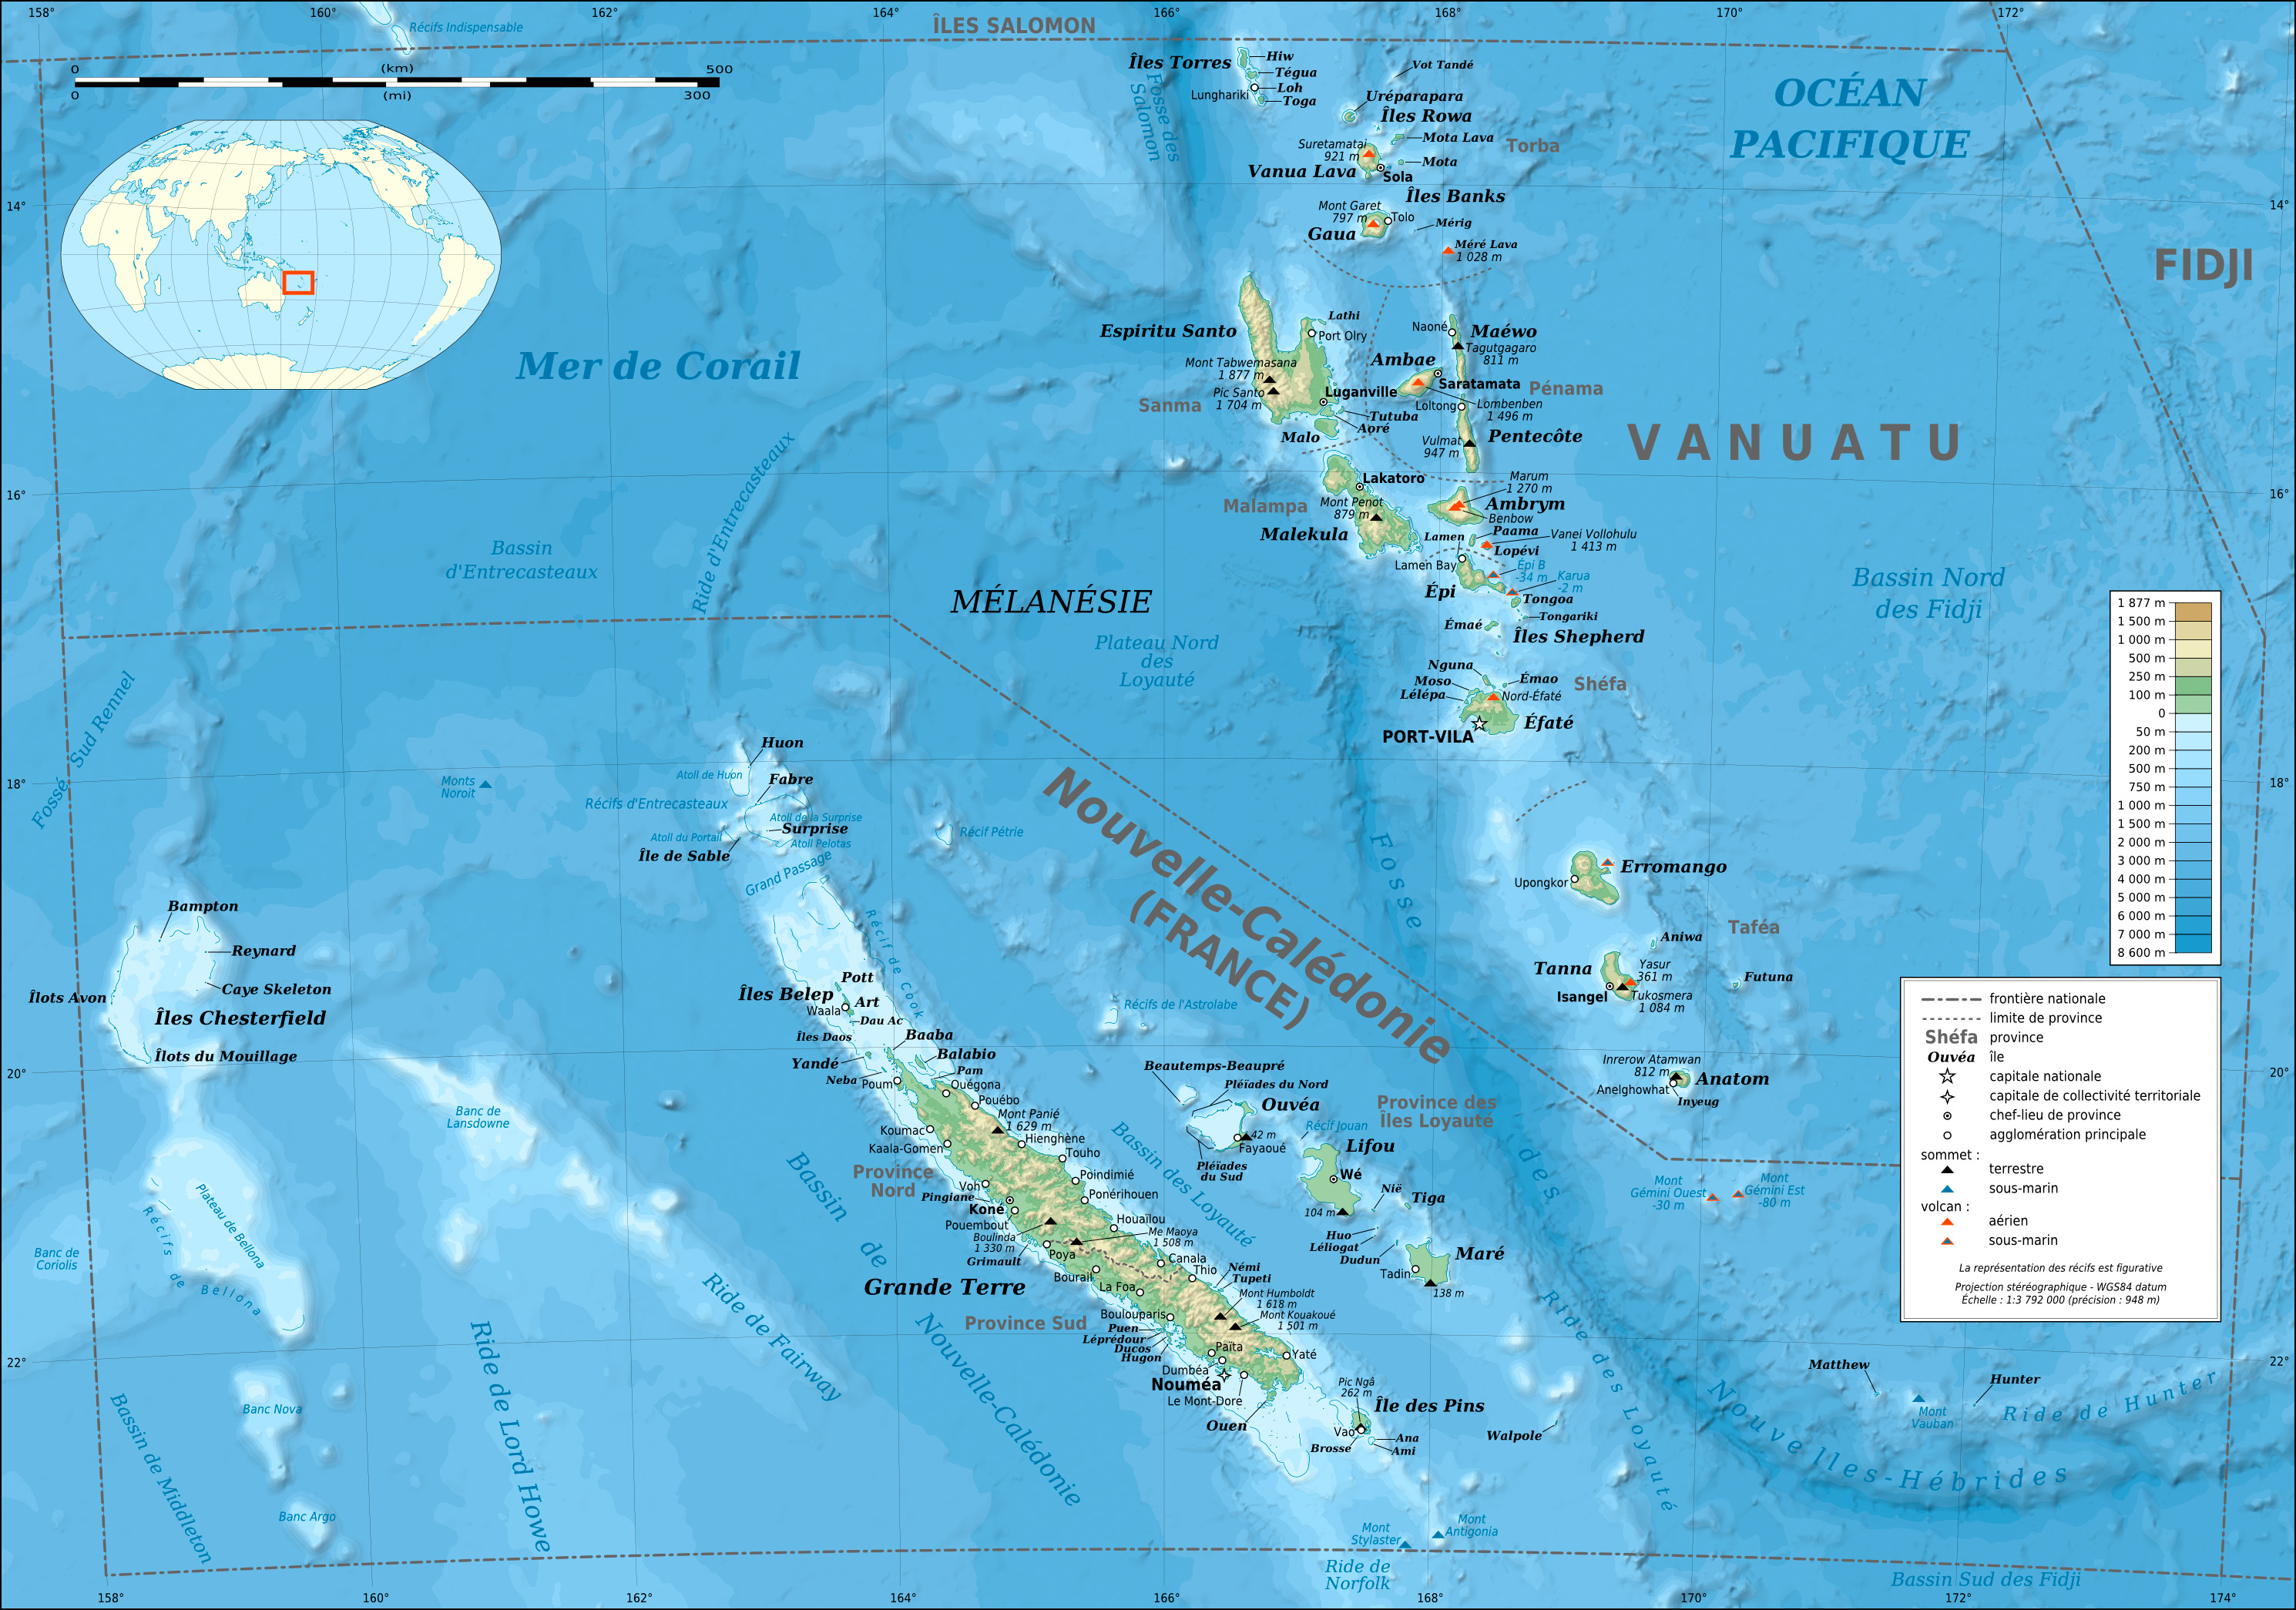 new_caledonia_and_vanuatu_bathymetric_and_topographic_map-fr.jpg